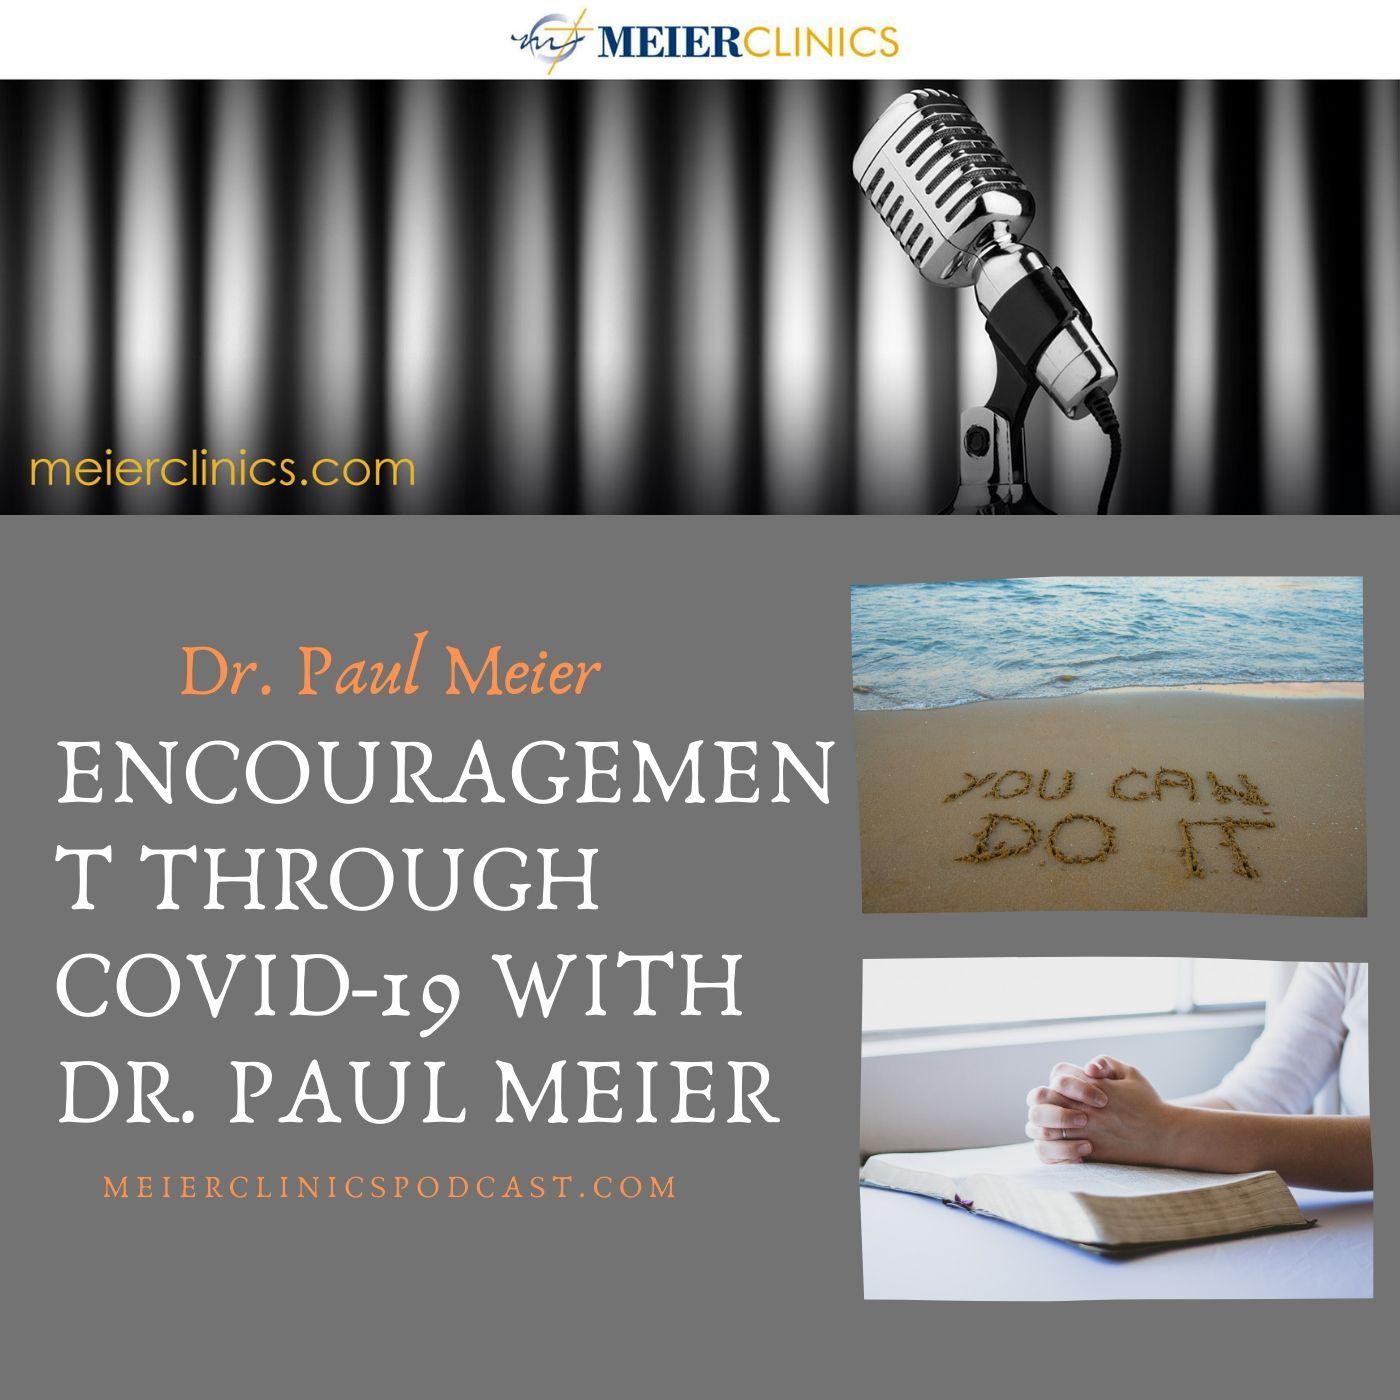 Encouragement through Covid-19 with Dr. Paul Meier